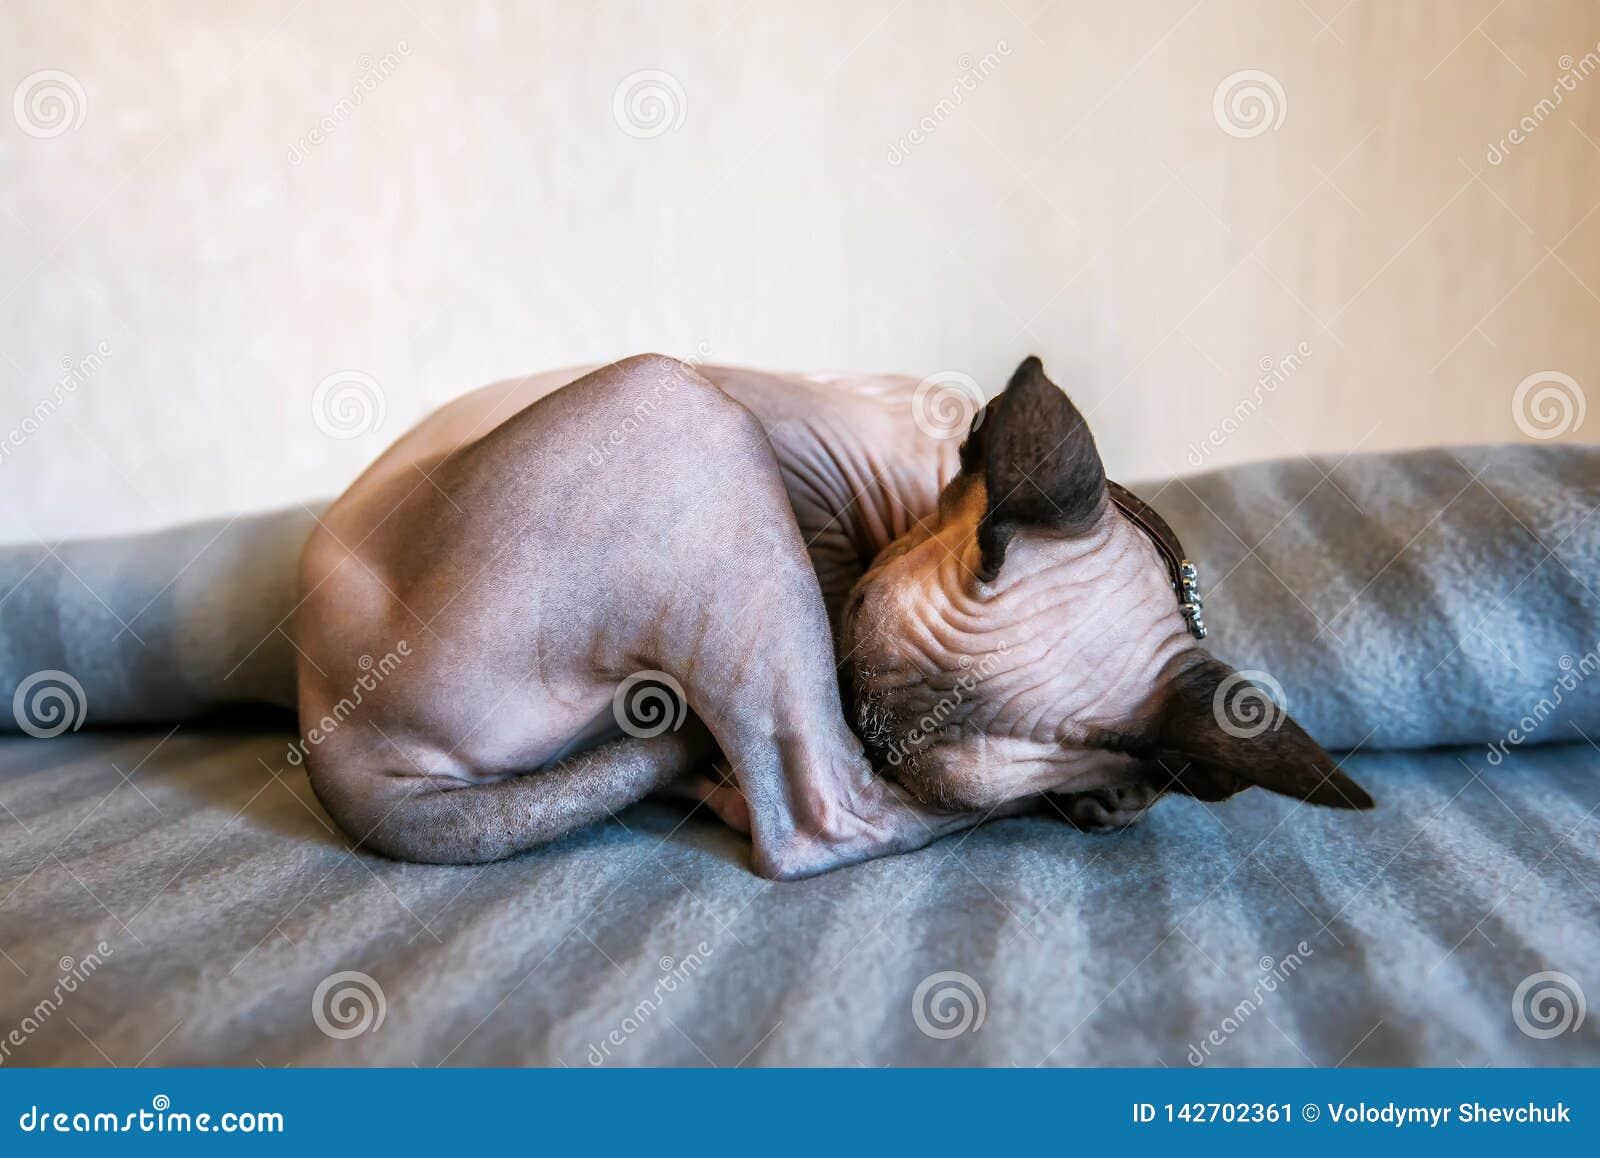 Sypialna sfinks figlarka